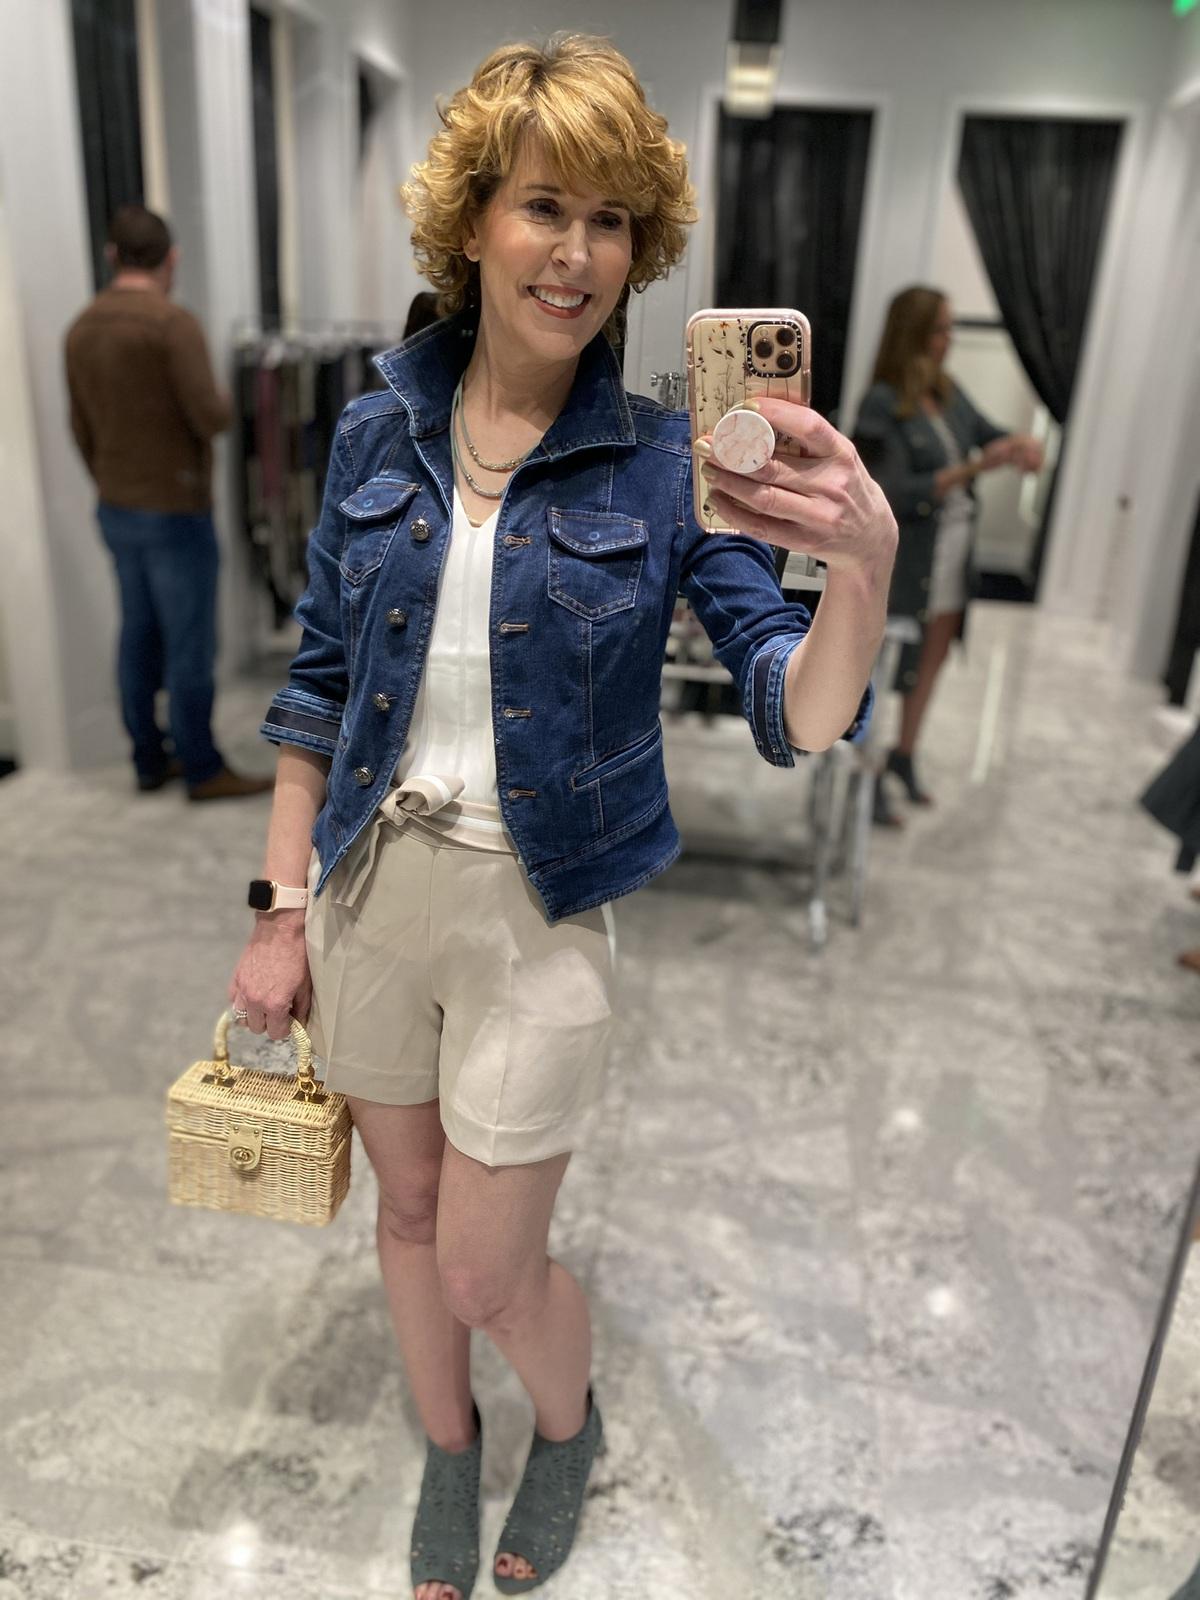 Mirror selfie of woman over 50 wearing white v-neck top khaki shorts with white trim denim jacket carrying wicker handbag doing spring wardrobe update